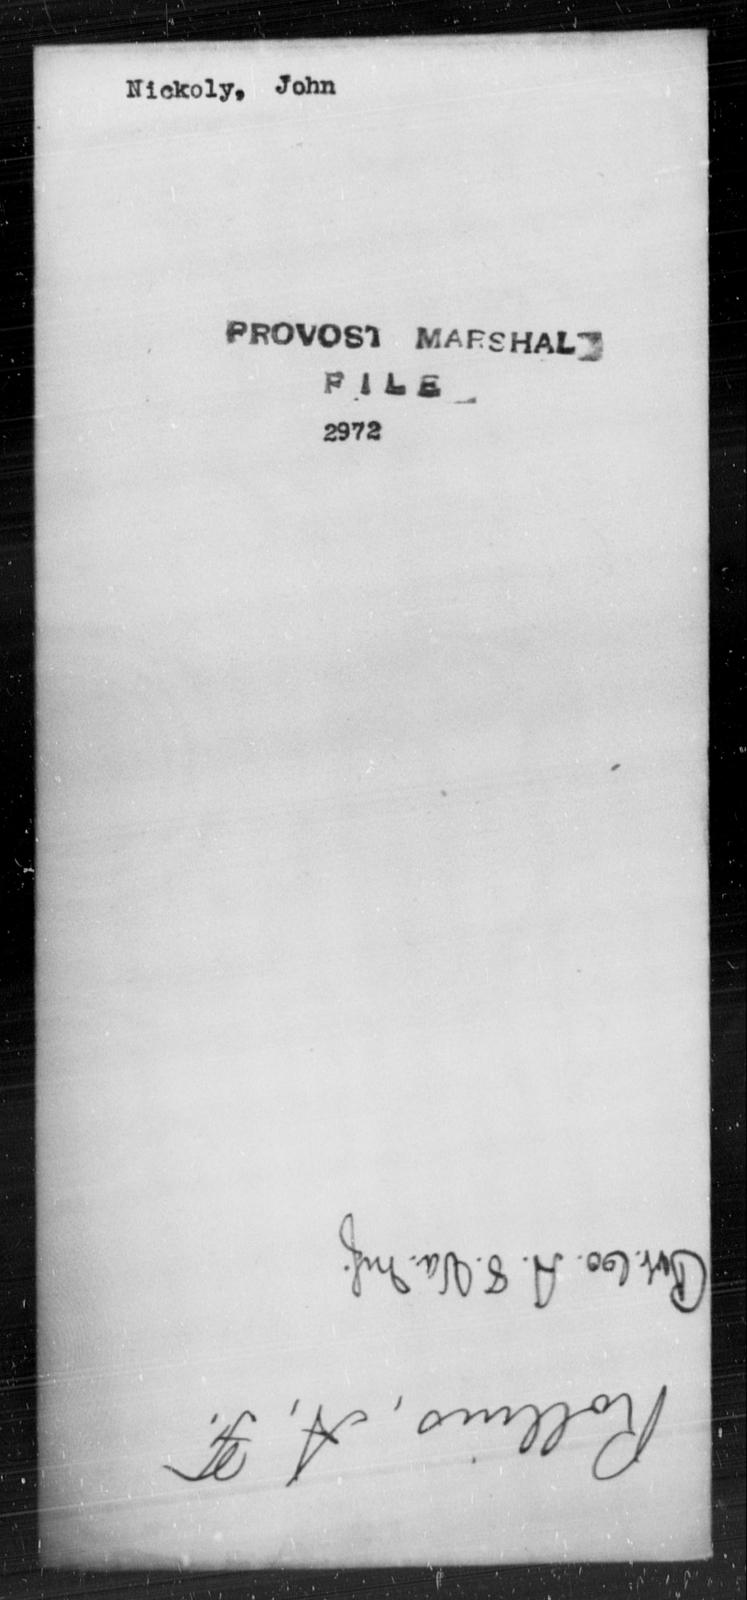 Nickoly, John - State: [Blank] - Year: [Blank]